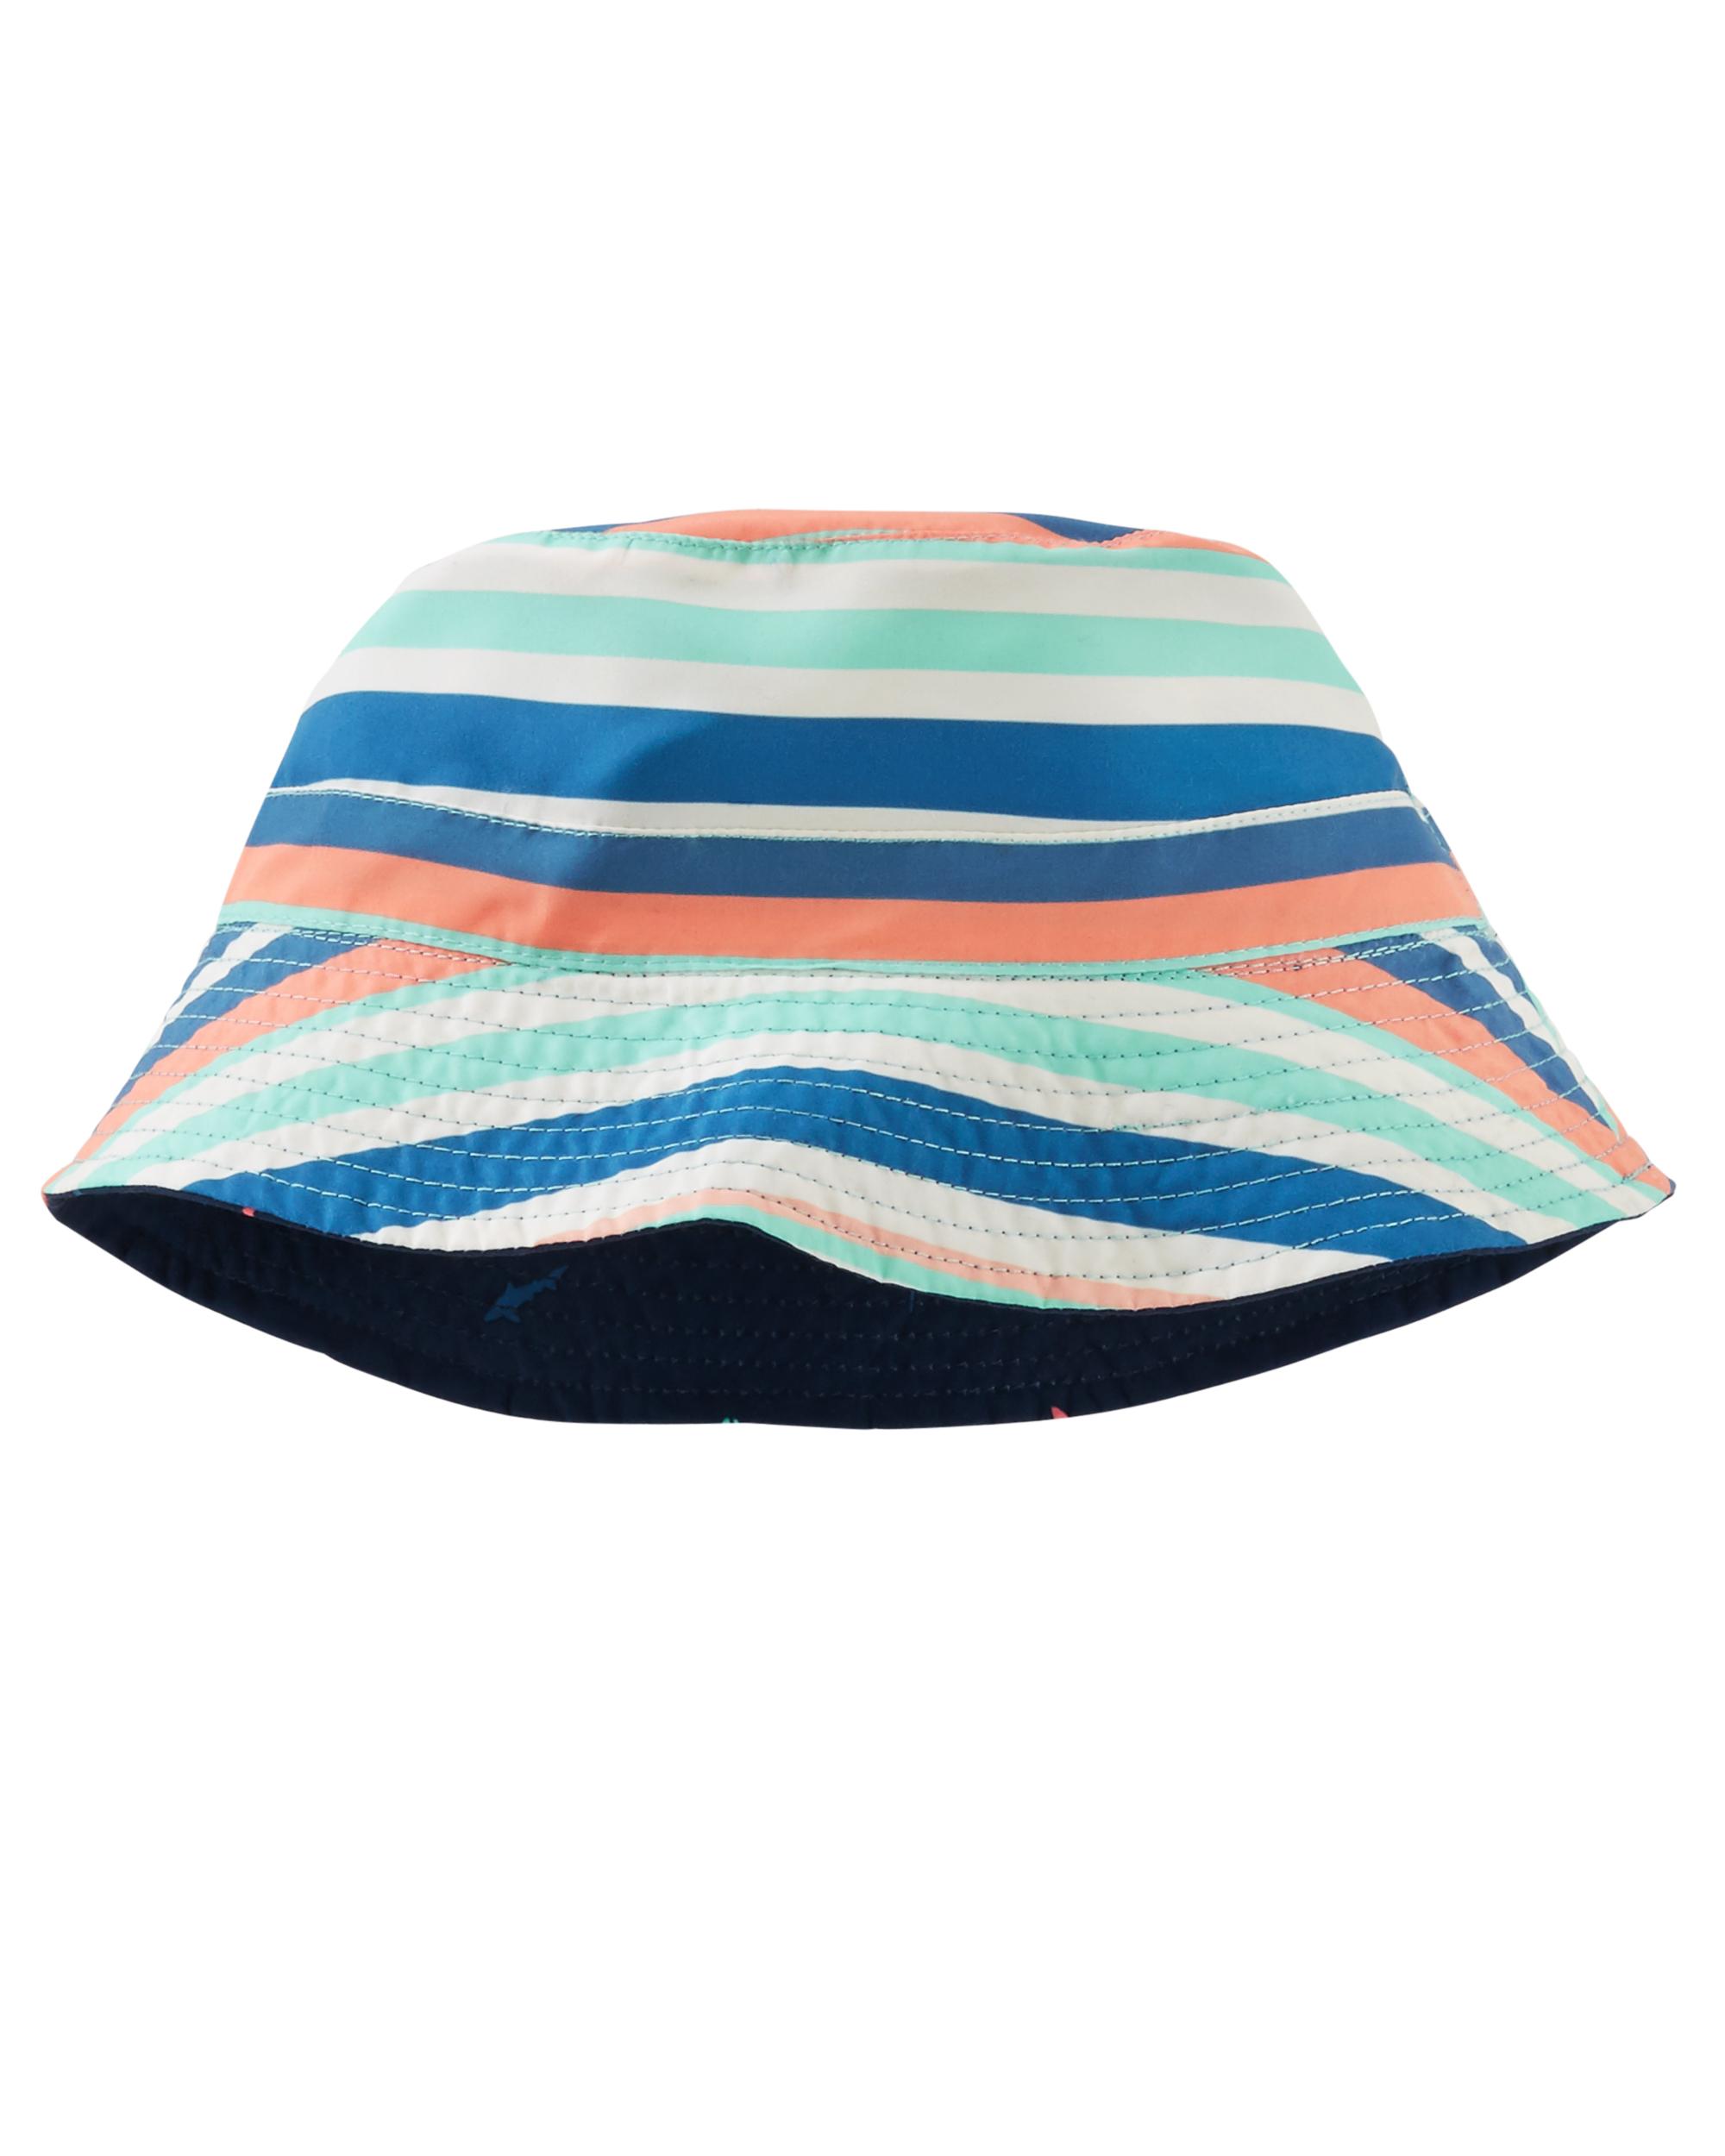 כובע דו צדדי נייבי/פסים